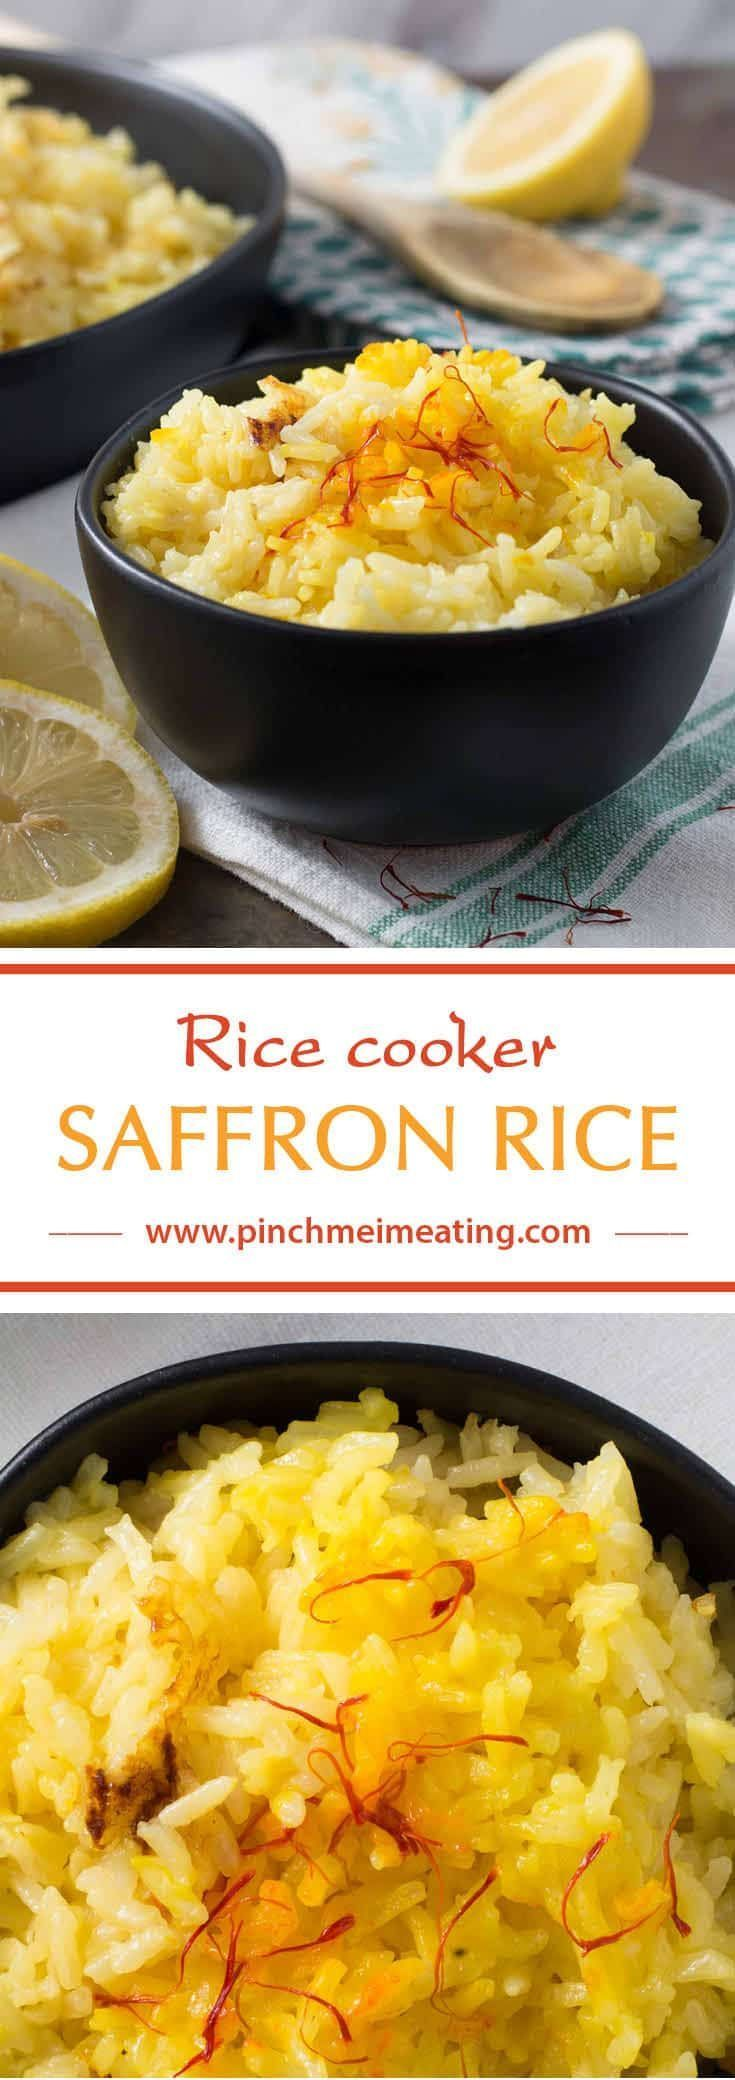 Rice Cooker Saffron Rice | Pinch me, I'm eating!